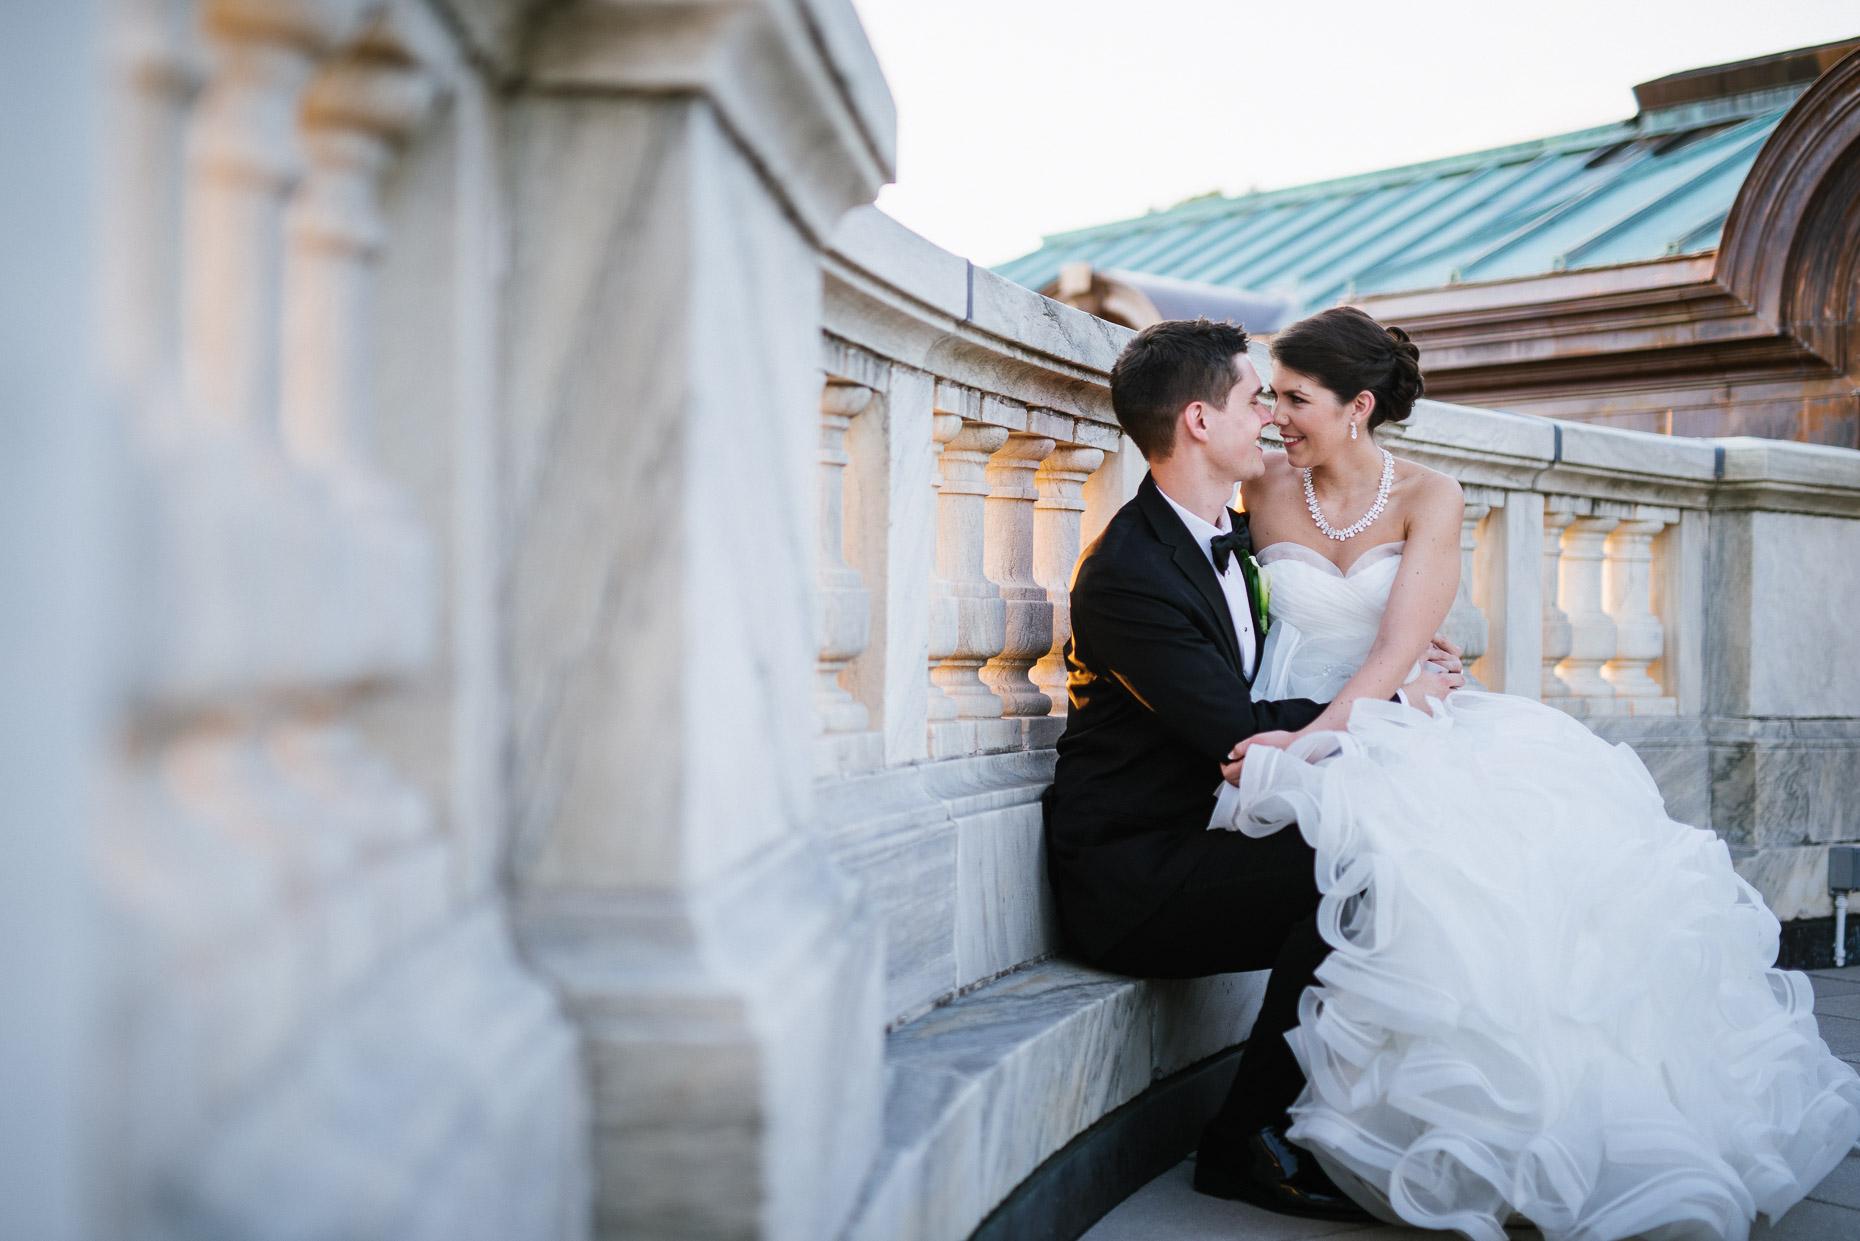 Weddings by Elliott O'Donovan - Washington DC_-19.jpg